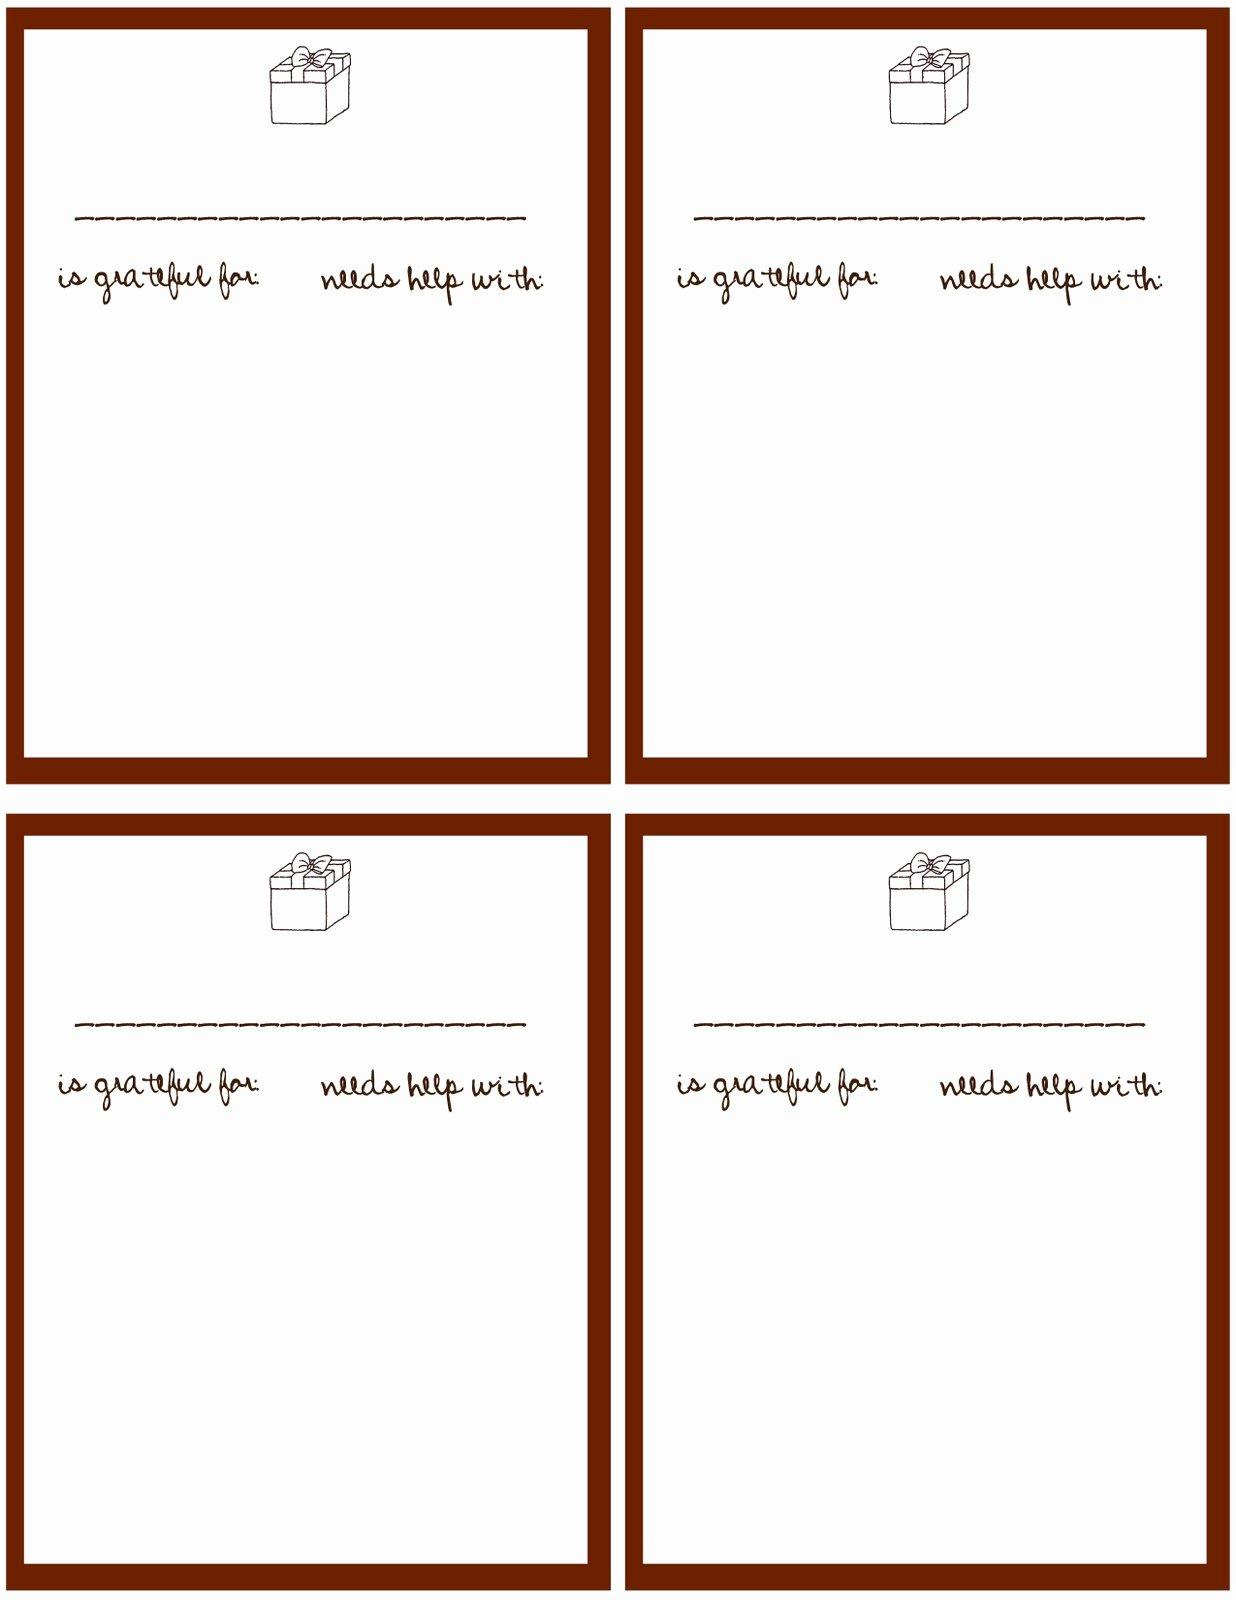 Prayer Card Template Free Beautiful Amber S Notebook Daily Prayer Cards Printable